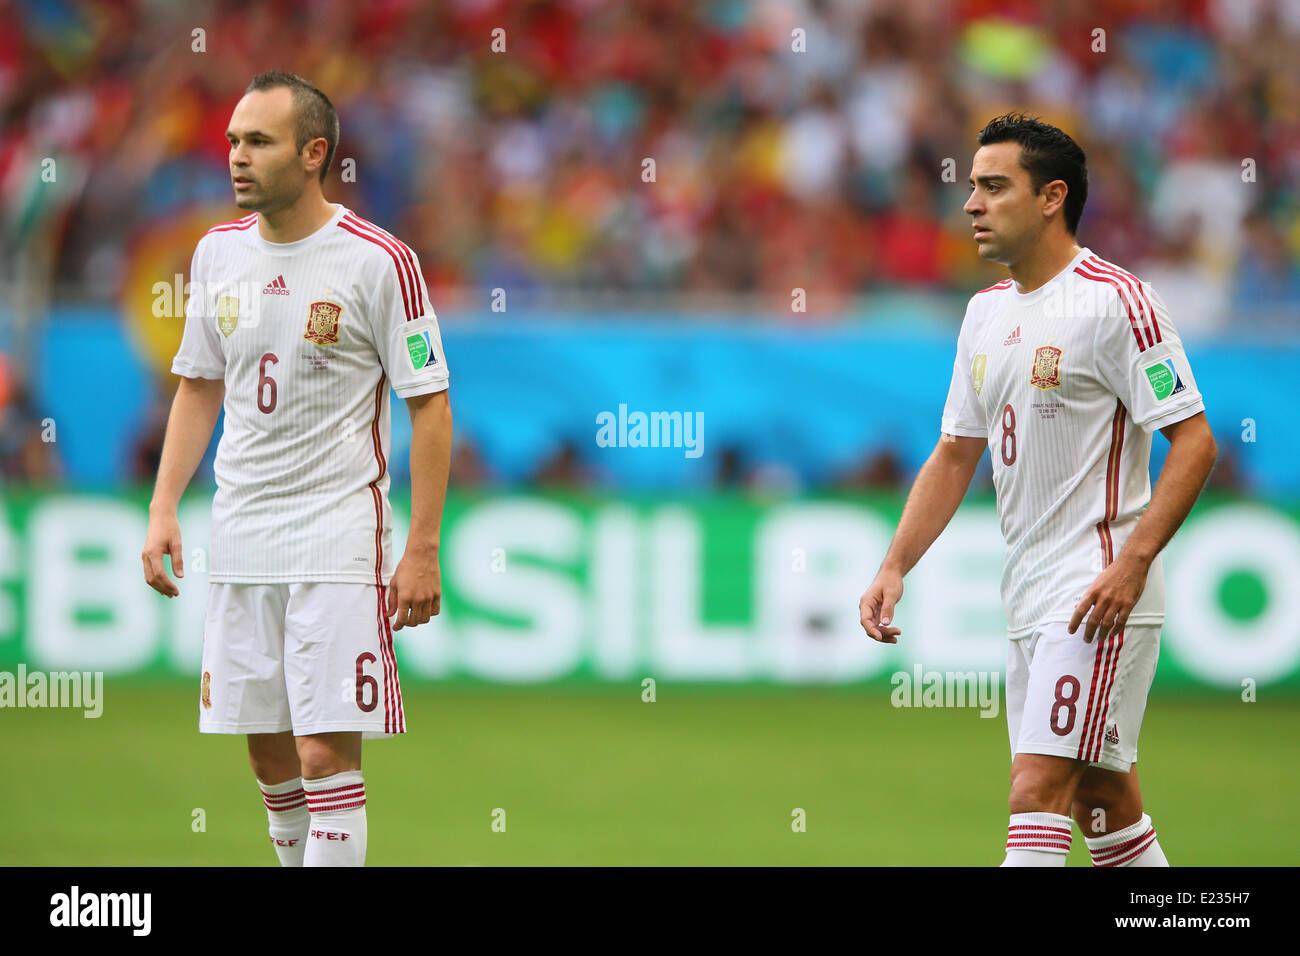 69f42328d Xavi And Iniesta Stock Photos   Xavi And Iniesta Stock Images - Alamy